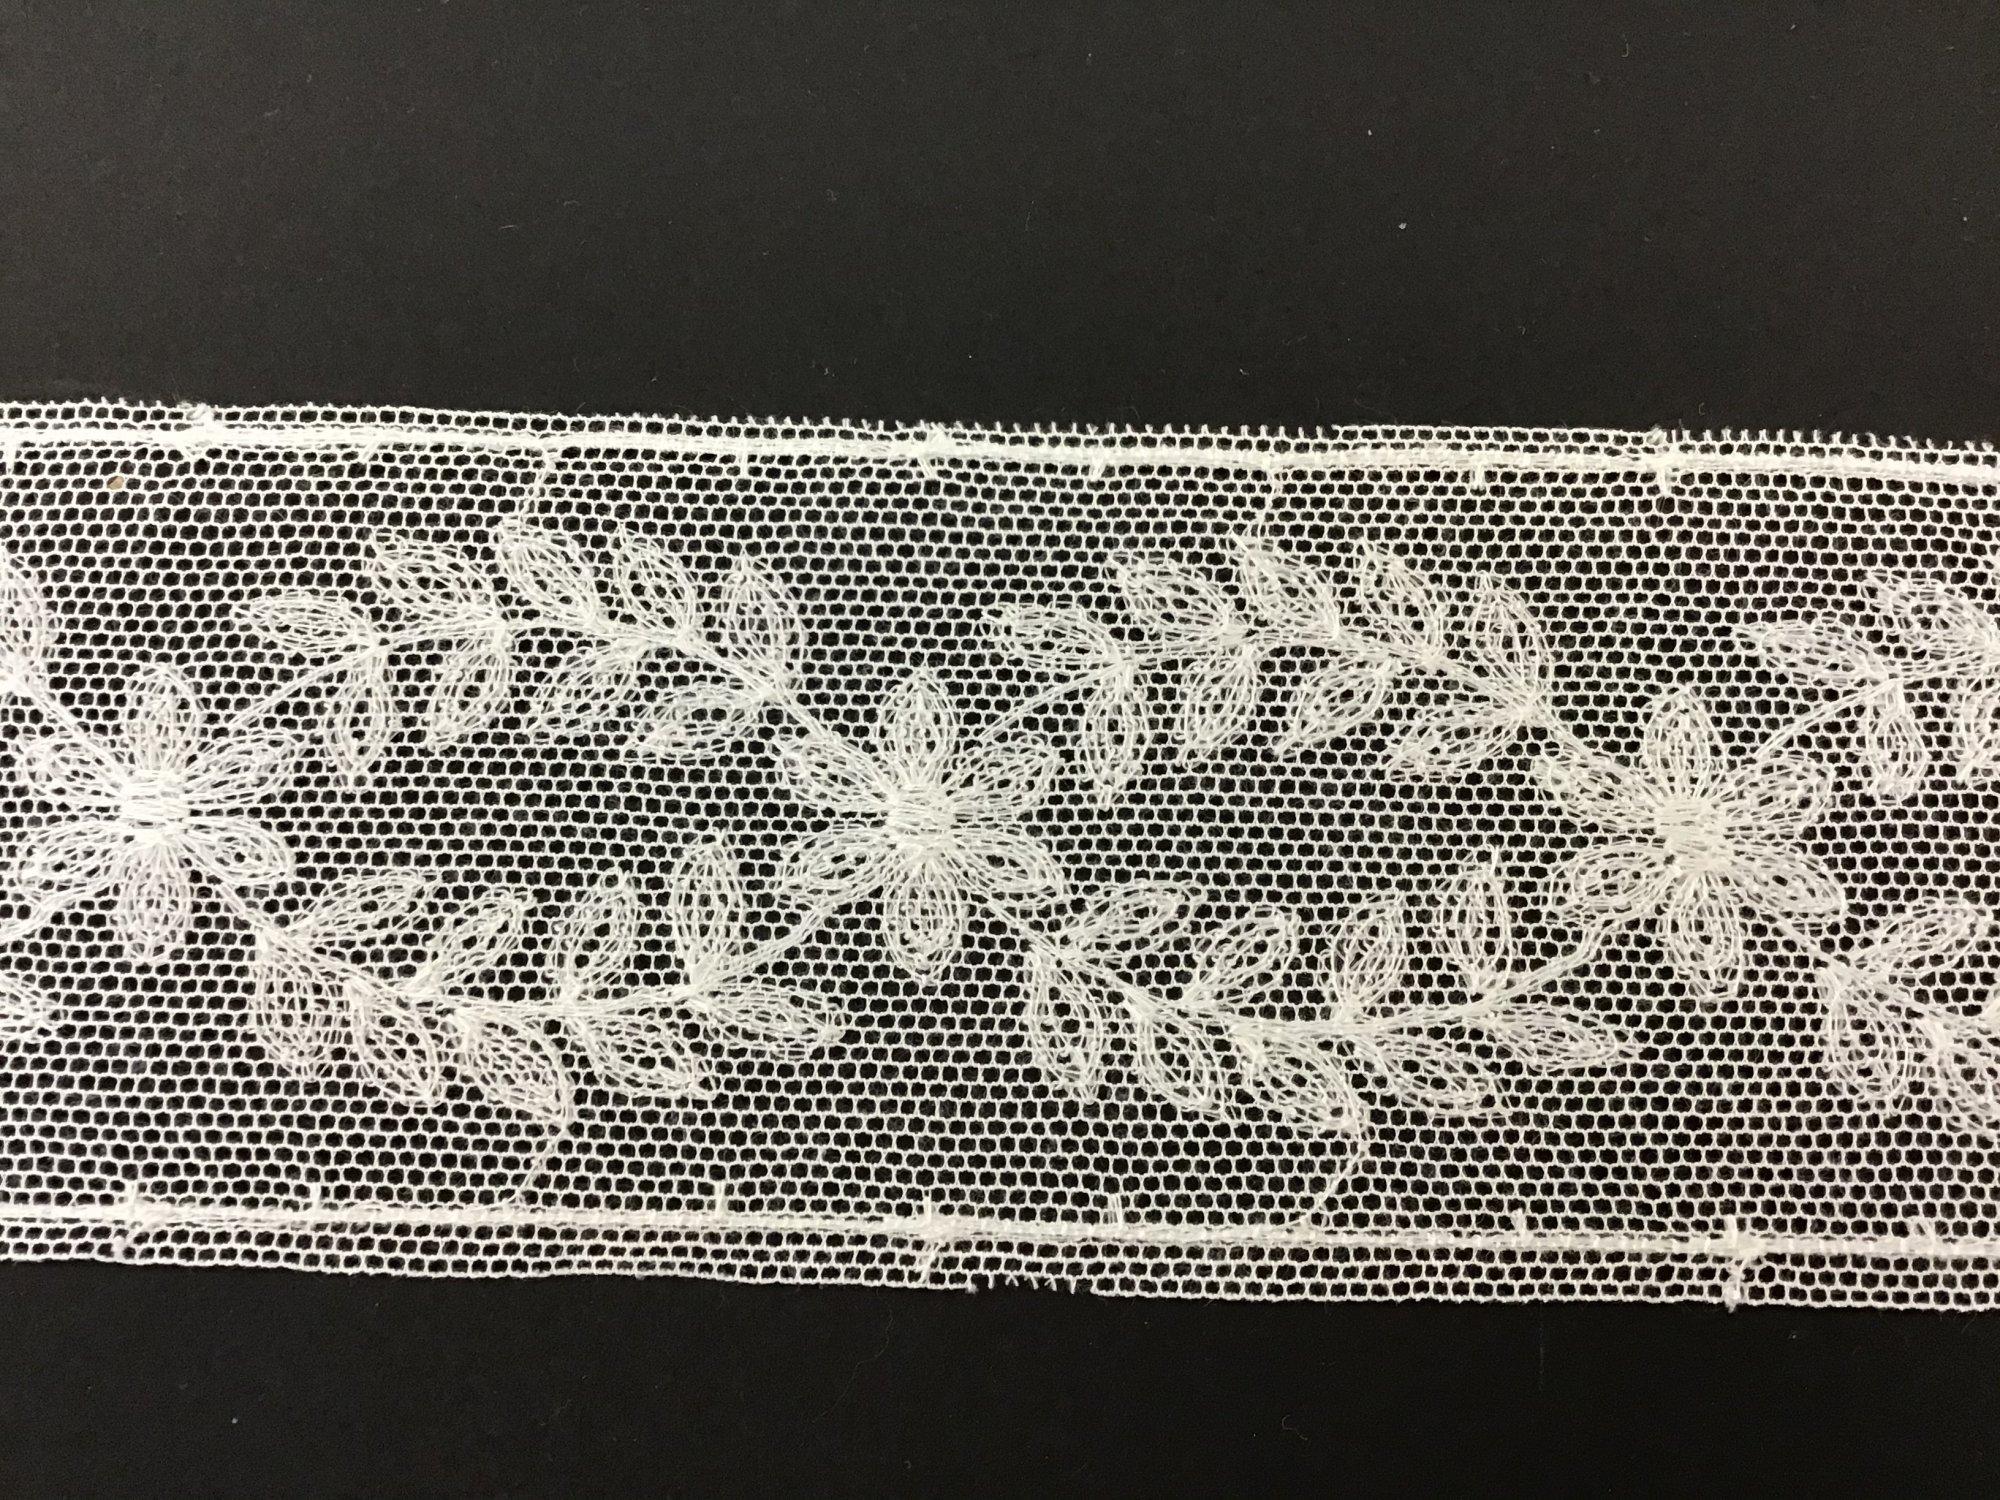 English Netting Lace Insertion 2.25 Soft White NM4259-C